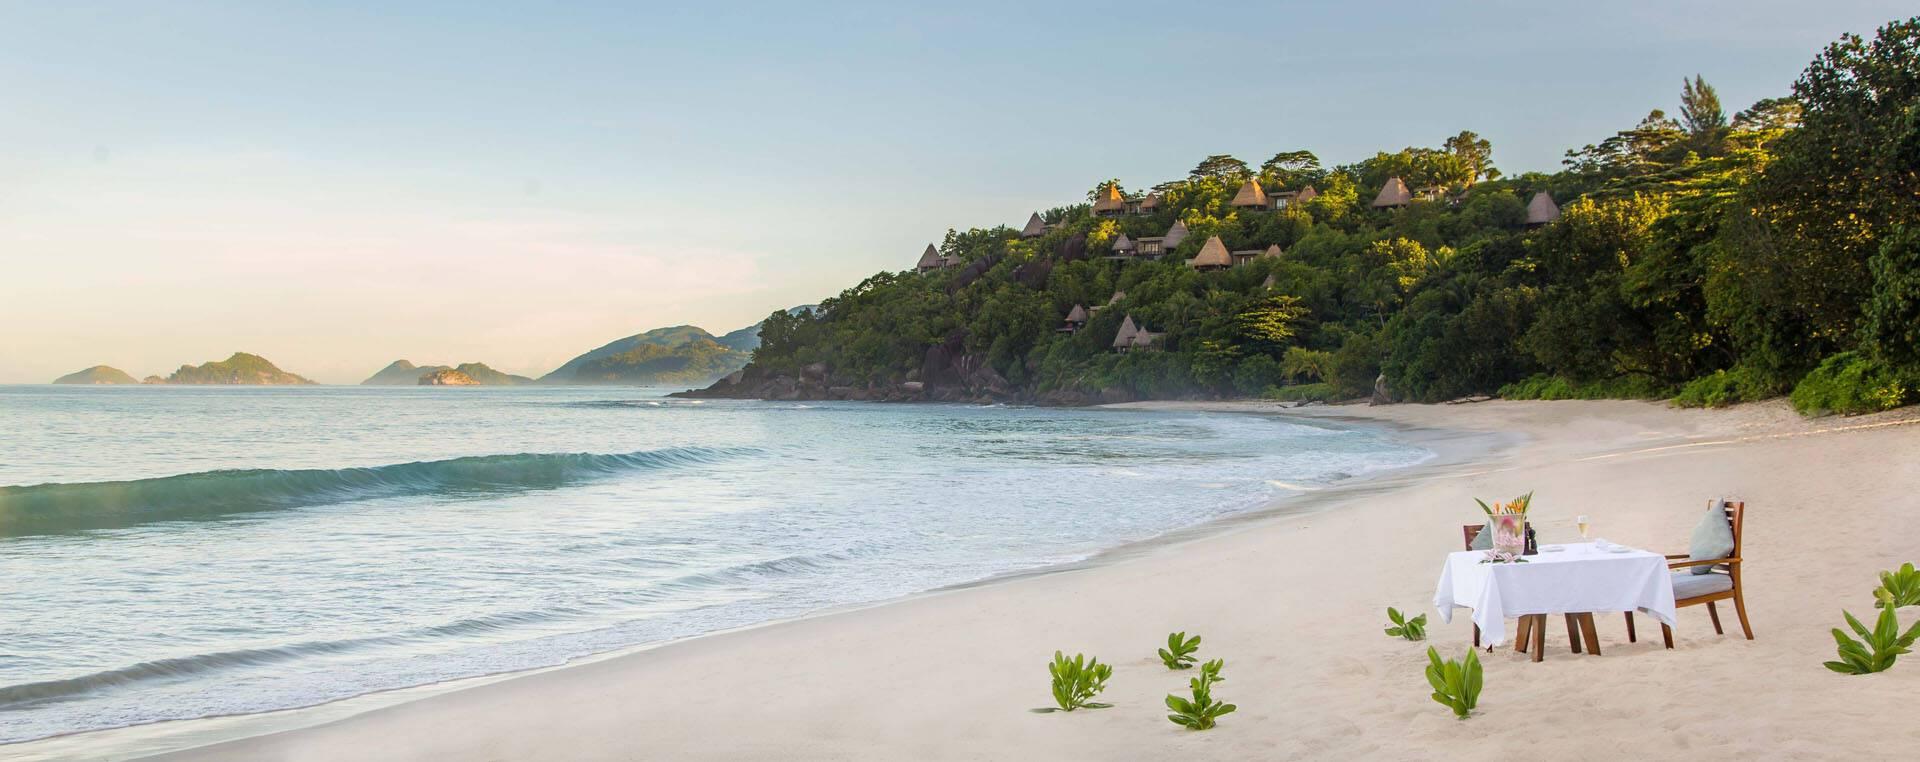 Anantara Maia Seychelles Villa Diner Romantique Plage